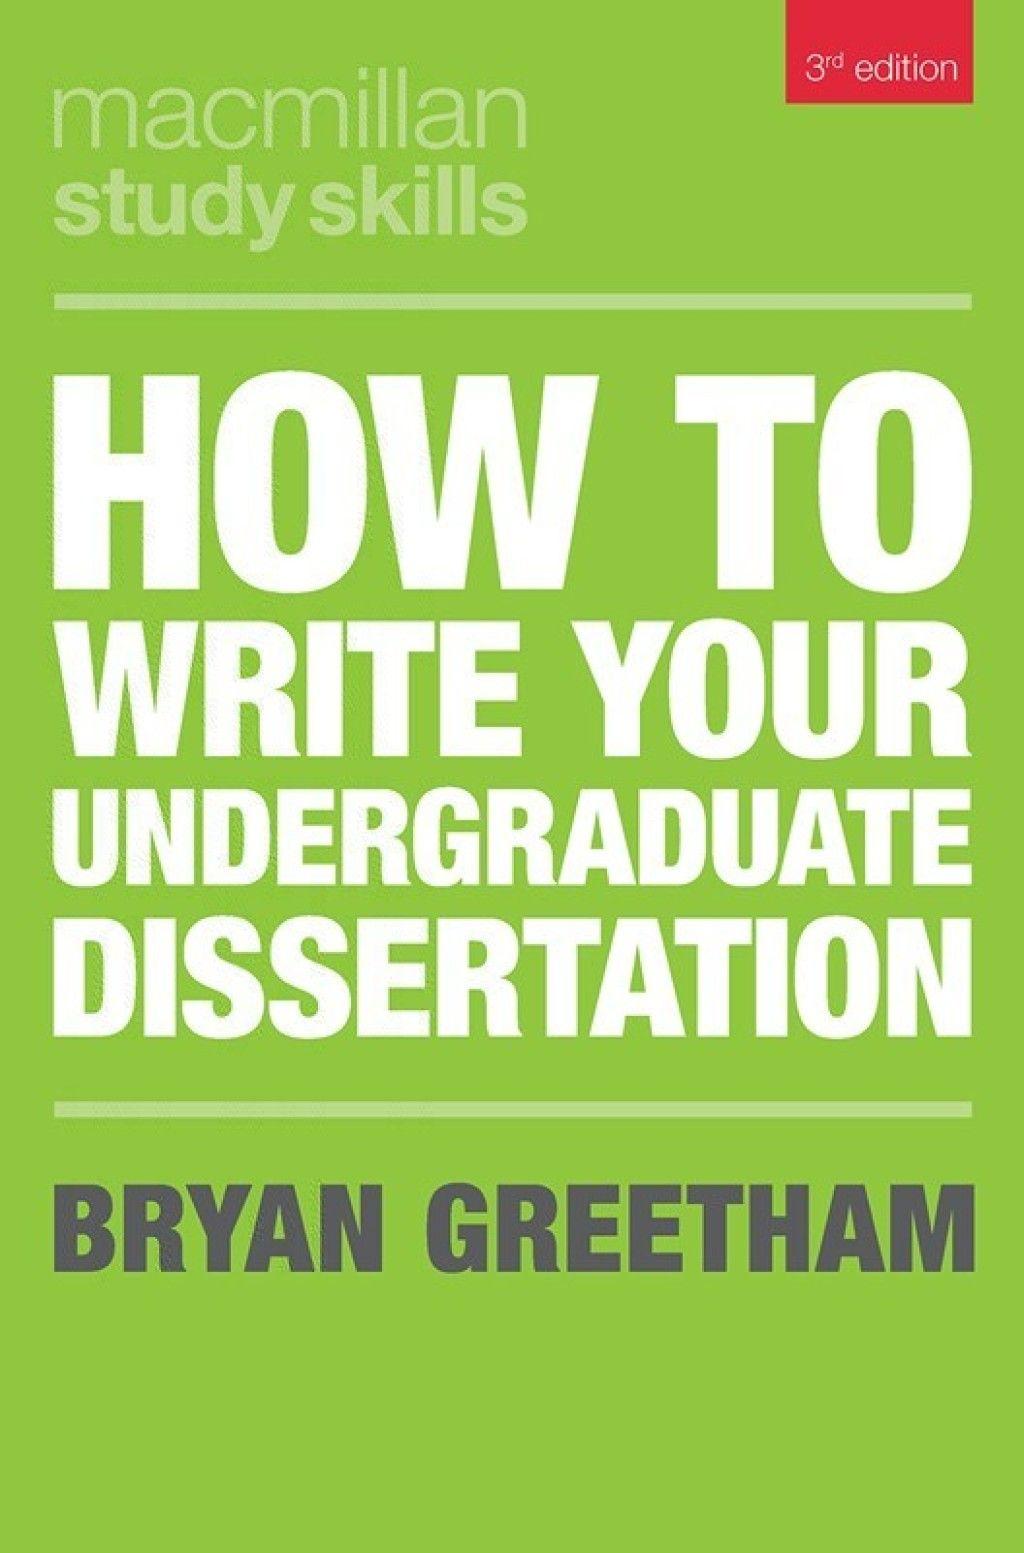 Dissertation surviving